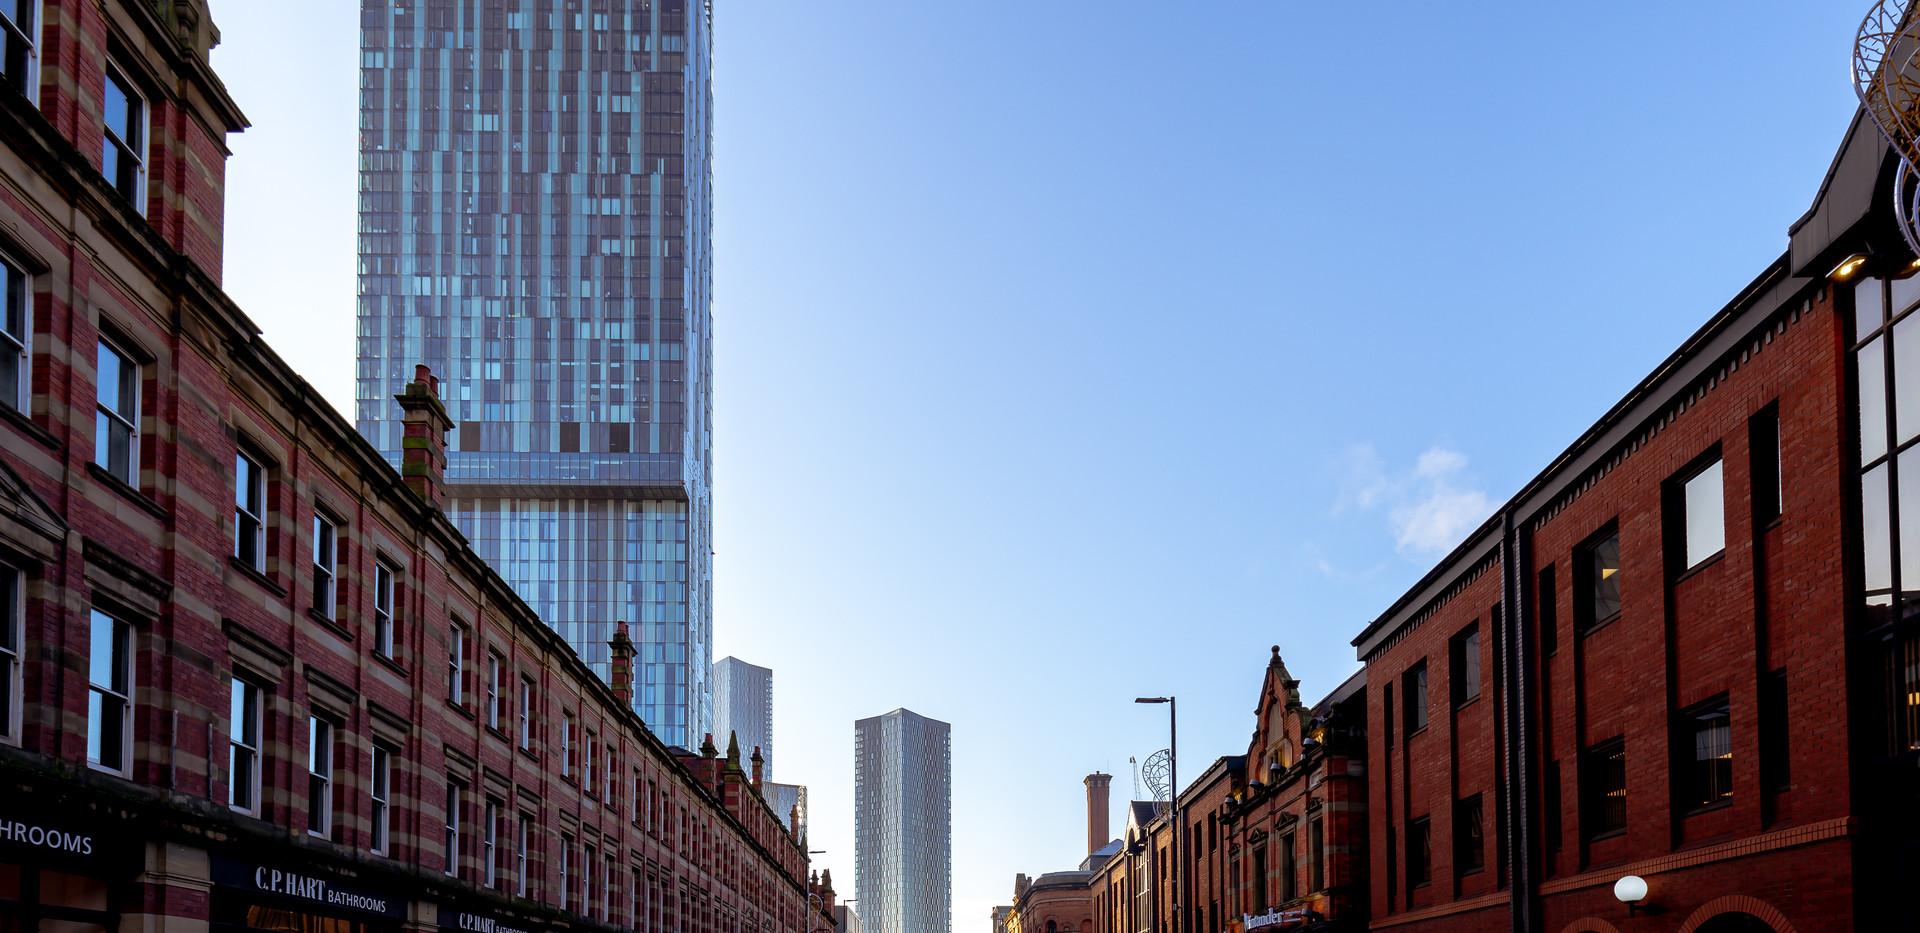 Manchester-0001.jpg